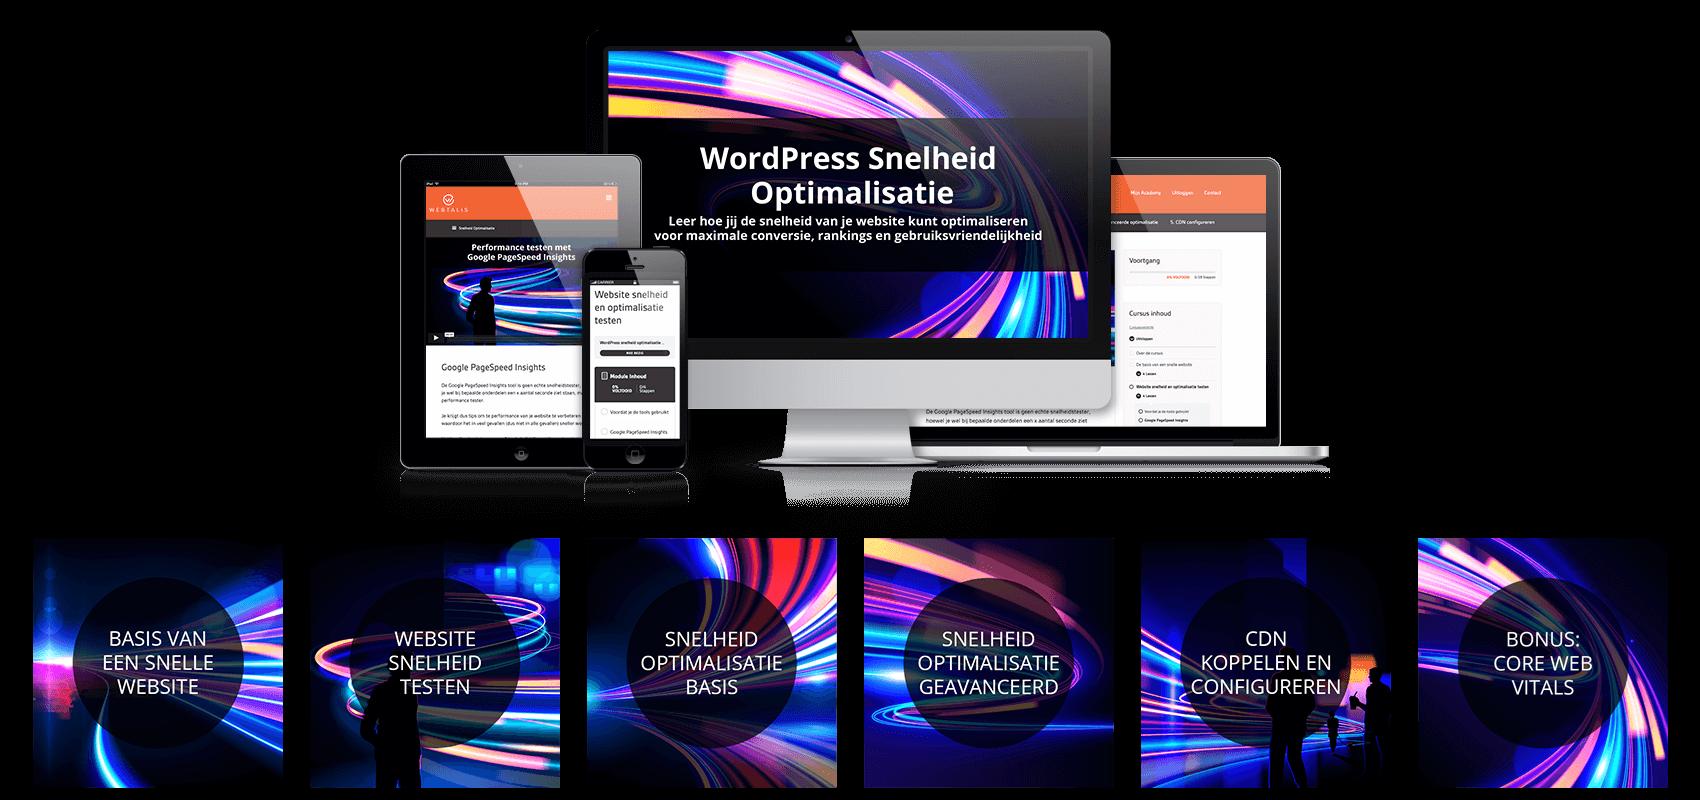 WordPress snelheid optimalisatie training